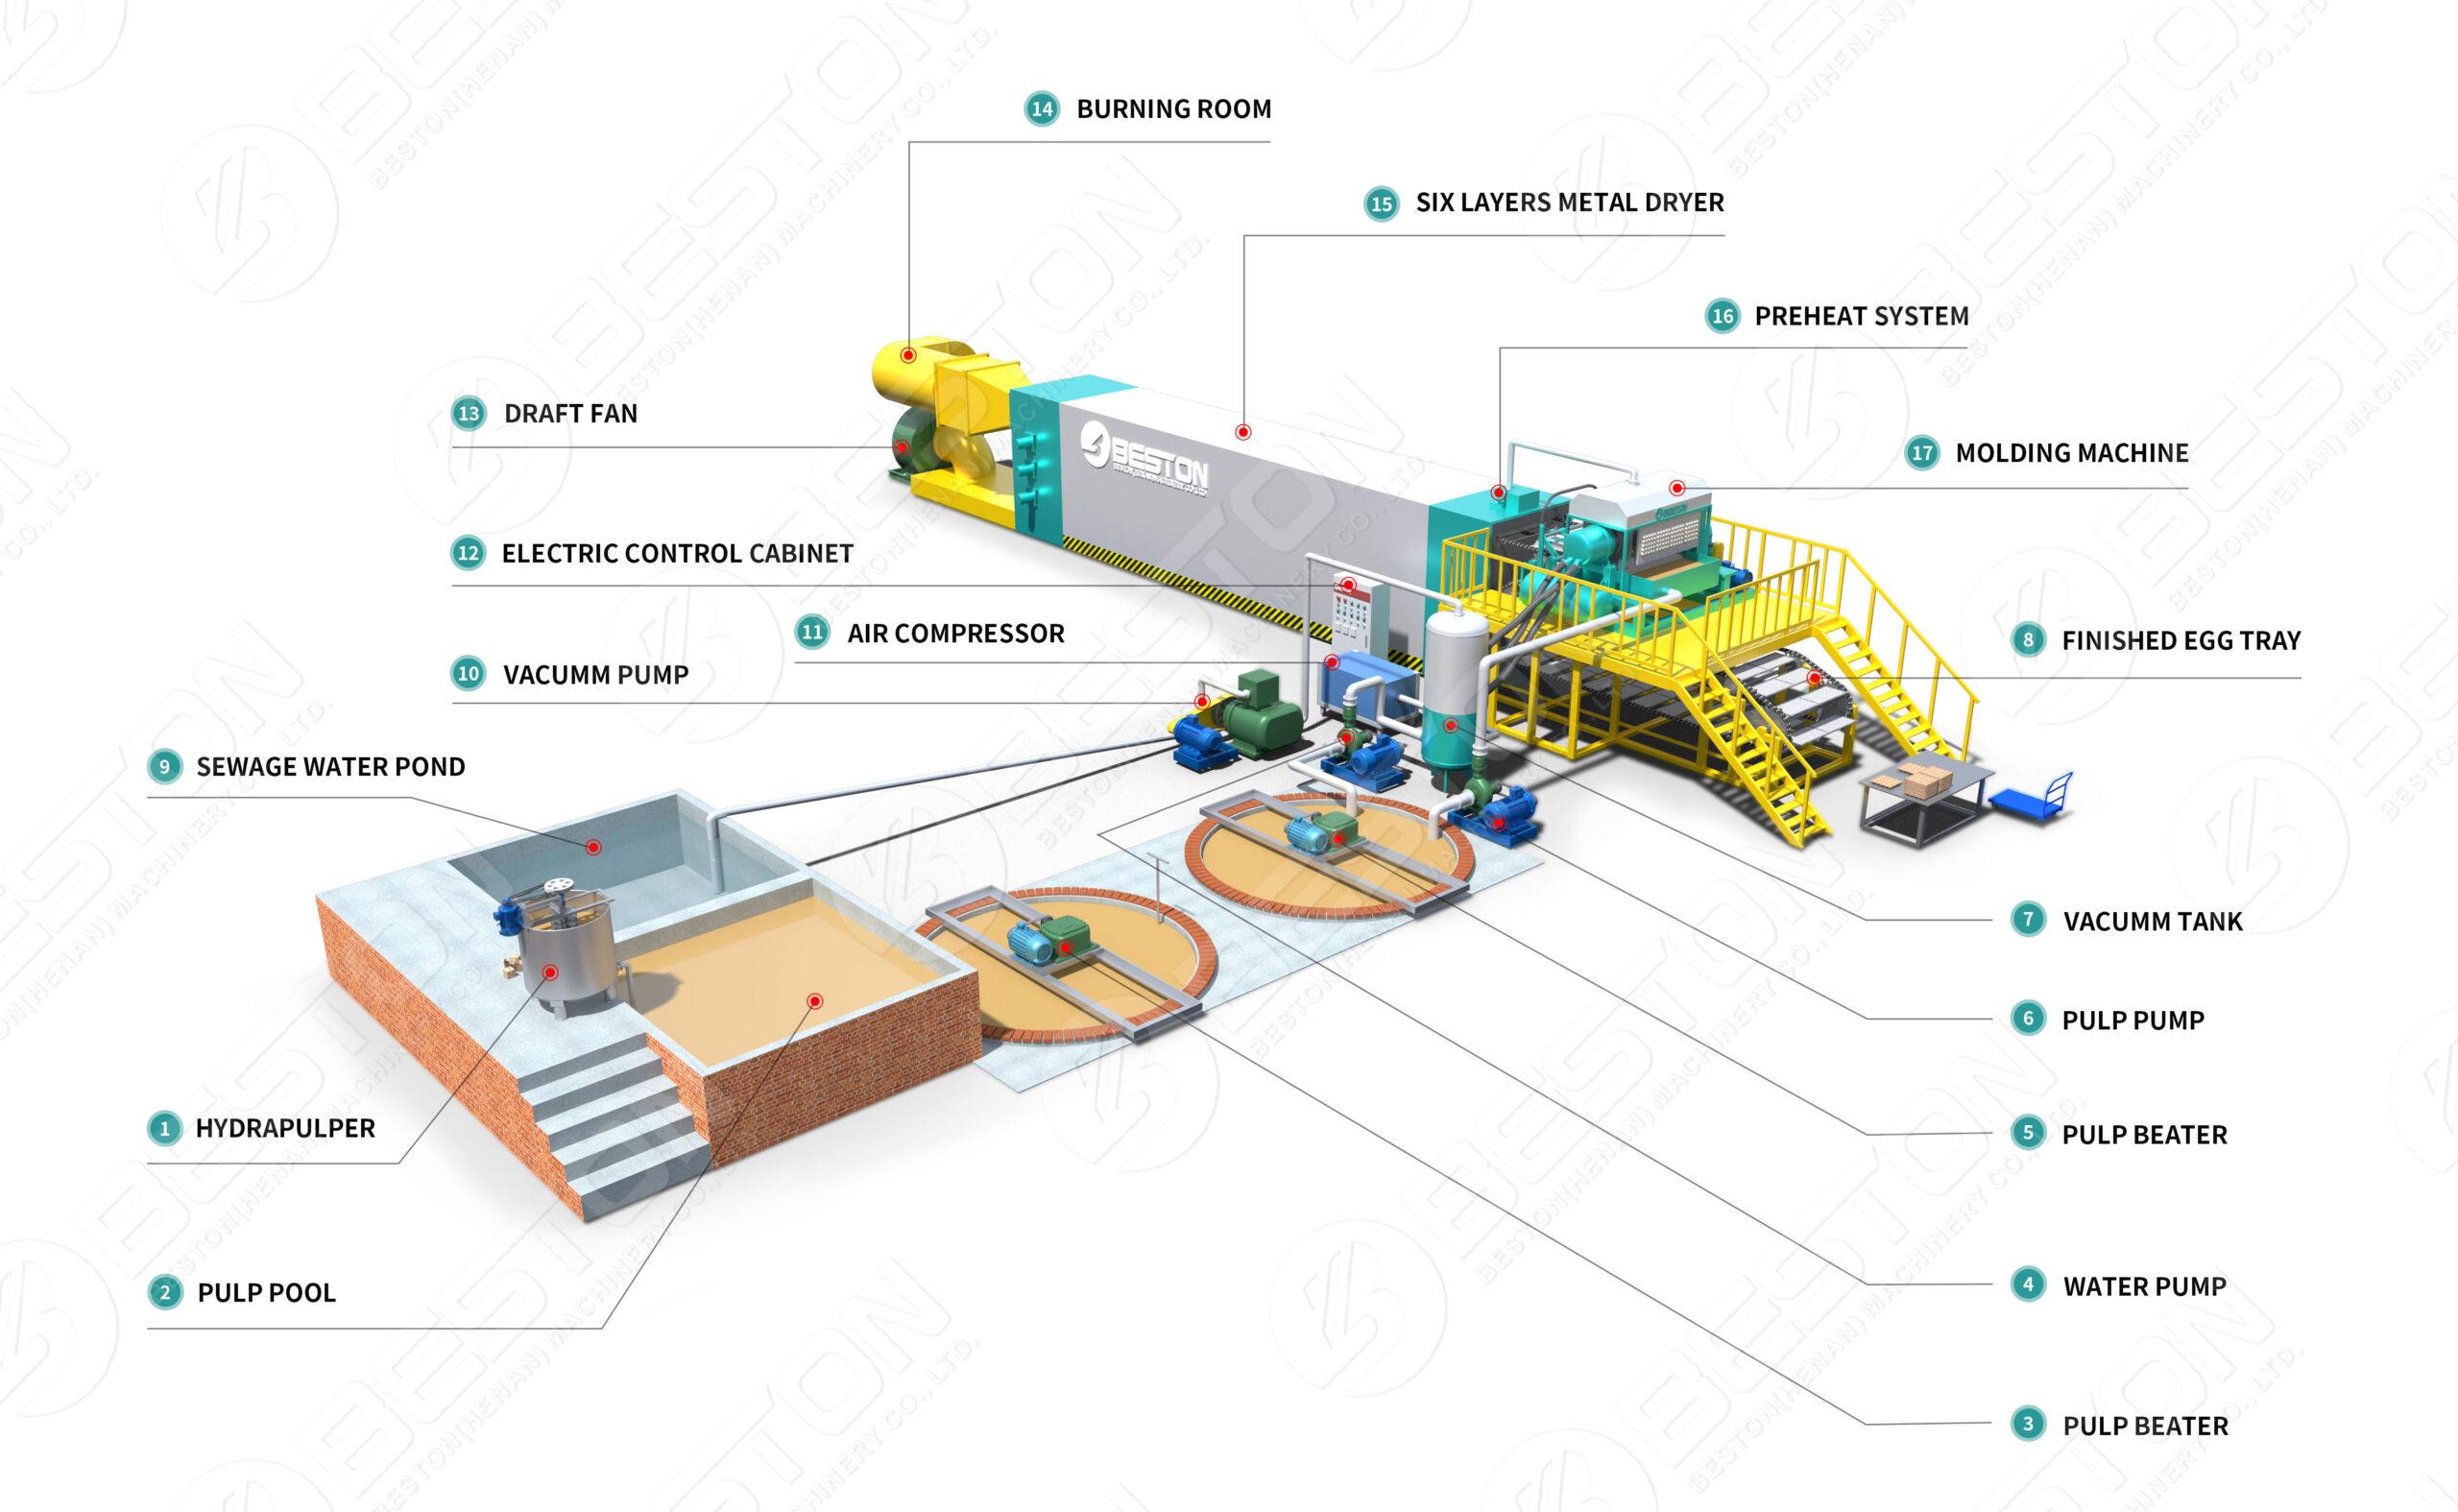 Processus de fabrication de carton d'oeufs